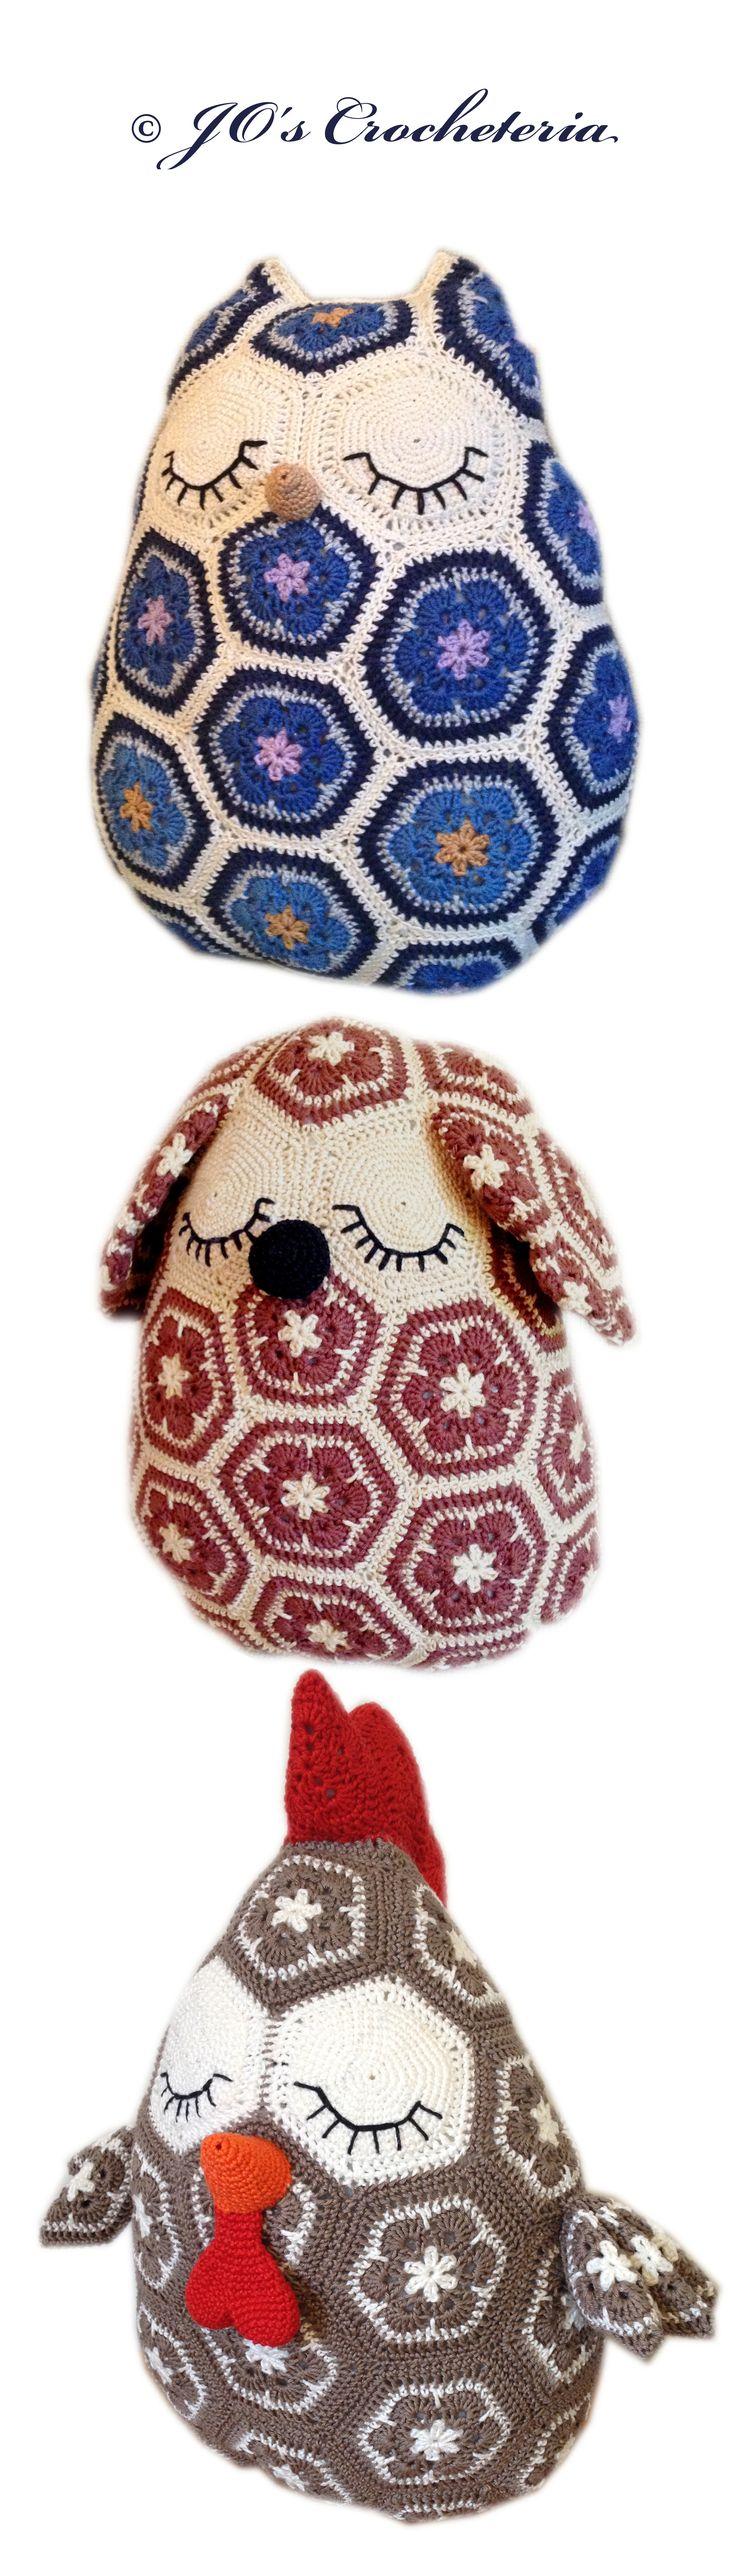 $14.50 USD African Flower Crochet Pattern Animal pillows - by JO's Crocheteria #crochet #crochetpattern #かぎ針編み #крючком #haken #crochetafricanflower #crochetafricanflowers #grannysquare #grannysquares #crochetgrannysquare #owl #dog #chicken #rooster #crochetowl #crochetdog #crochetchicken #crochetrooster #crochetthanksgivning #crochetpillow #joscrocheteria #cushion #blue #crochetblue #virka #crochetdogpattern http://www.ravelry.com/patterns/sources/african-flower-animal-pillows-e-book-8